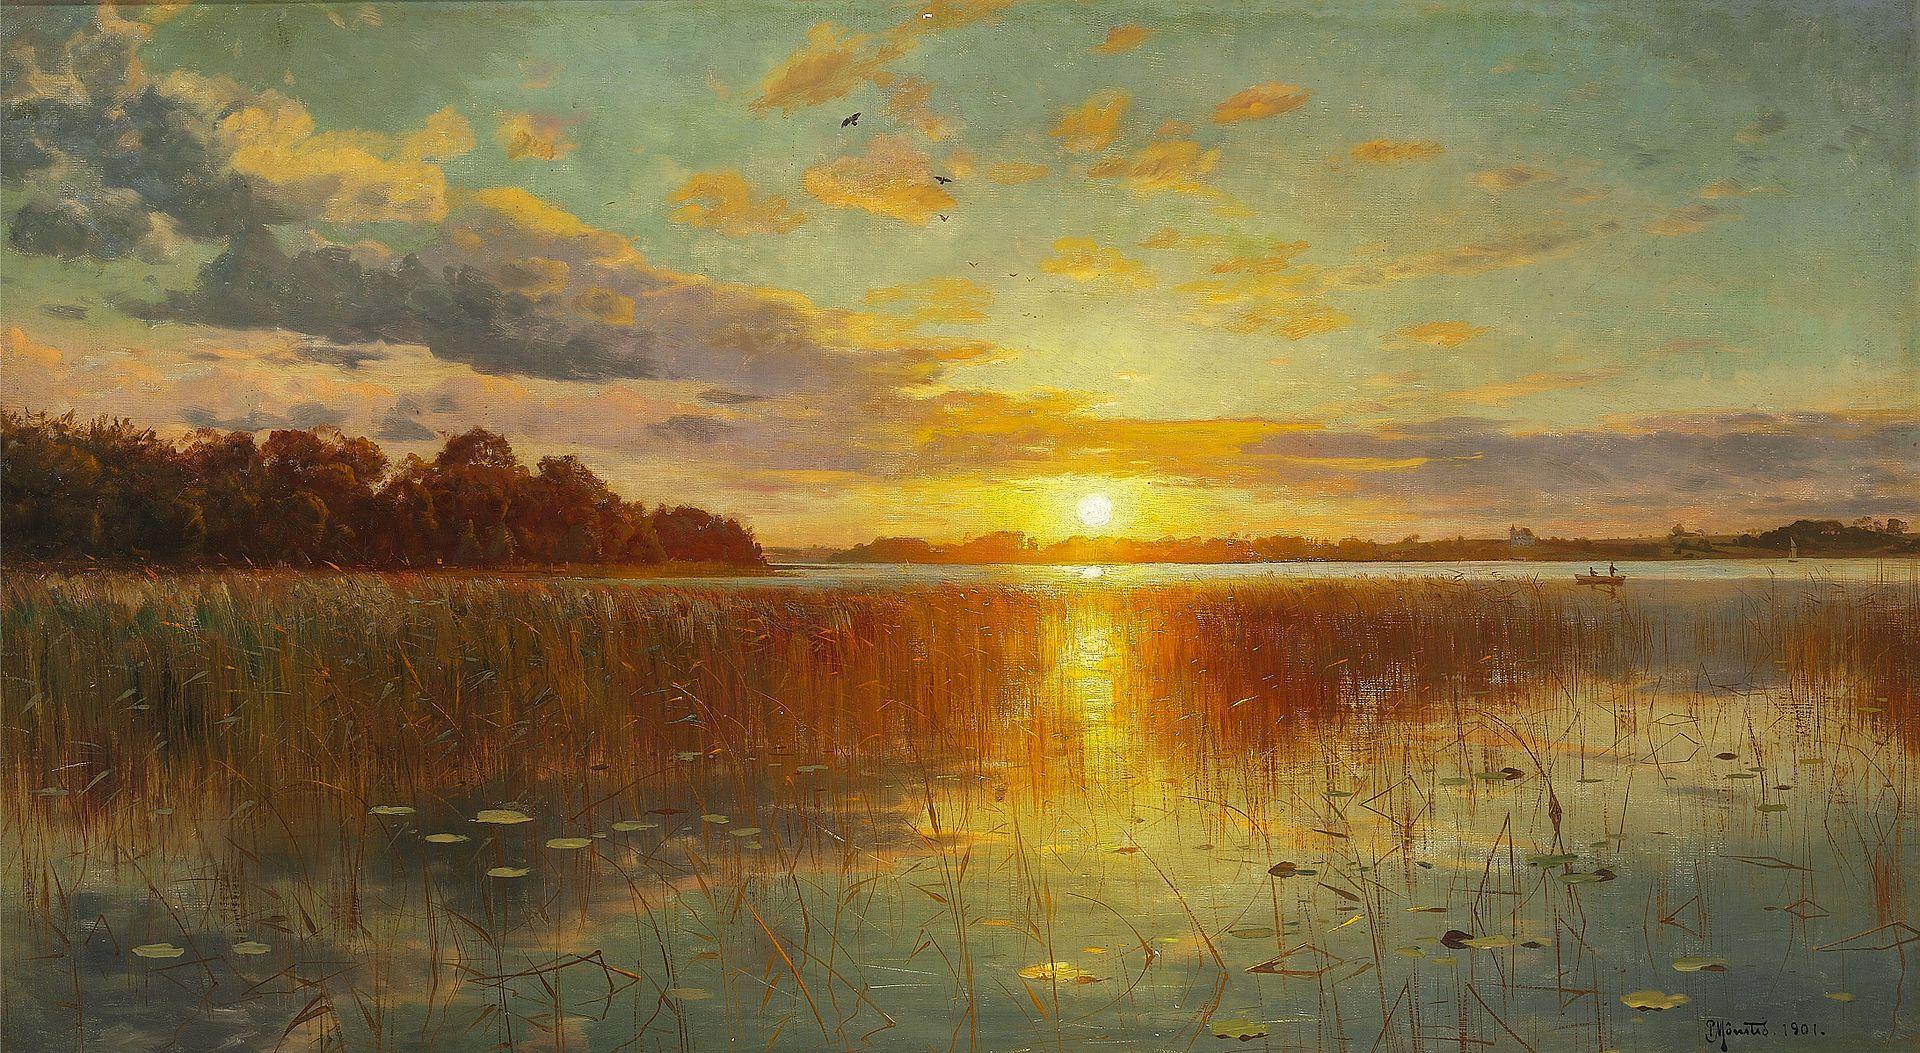 Peder_Mønsted_-_Sunset_over_a_Danish_Fiord.jpg